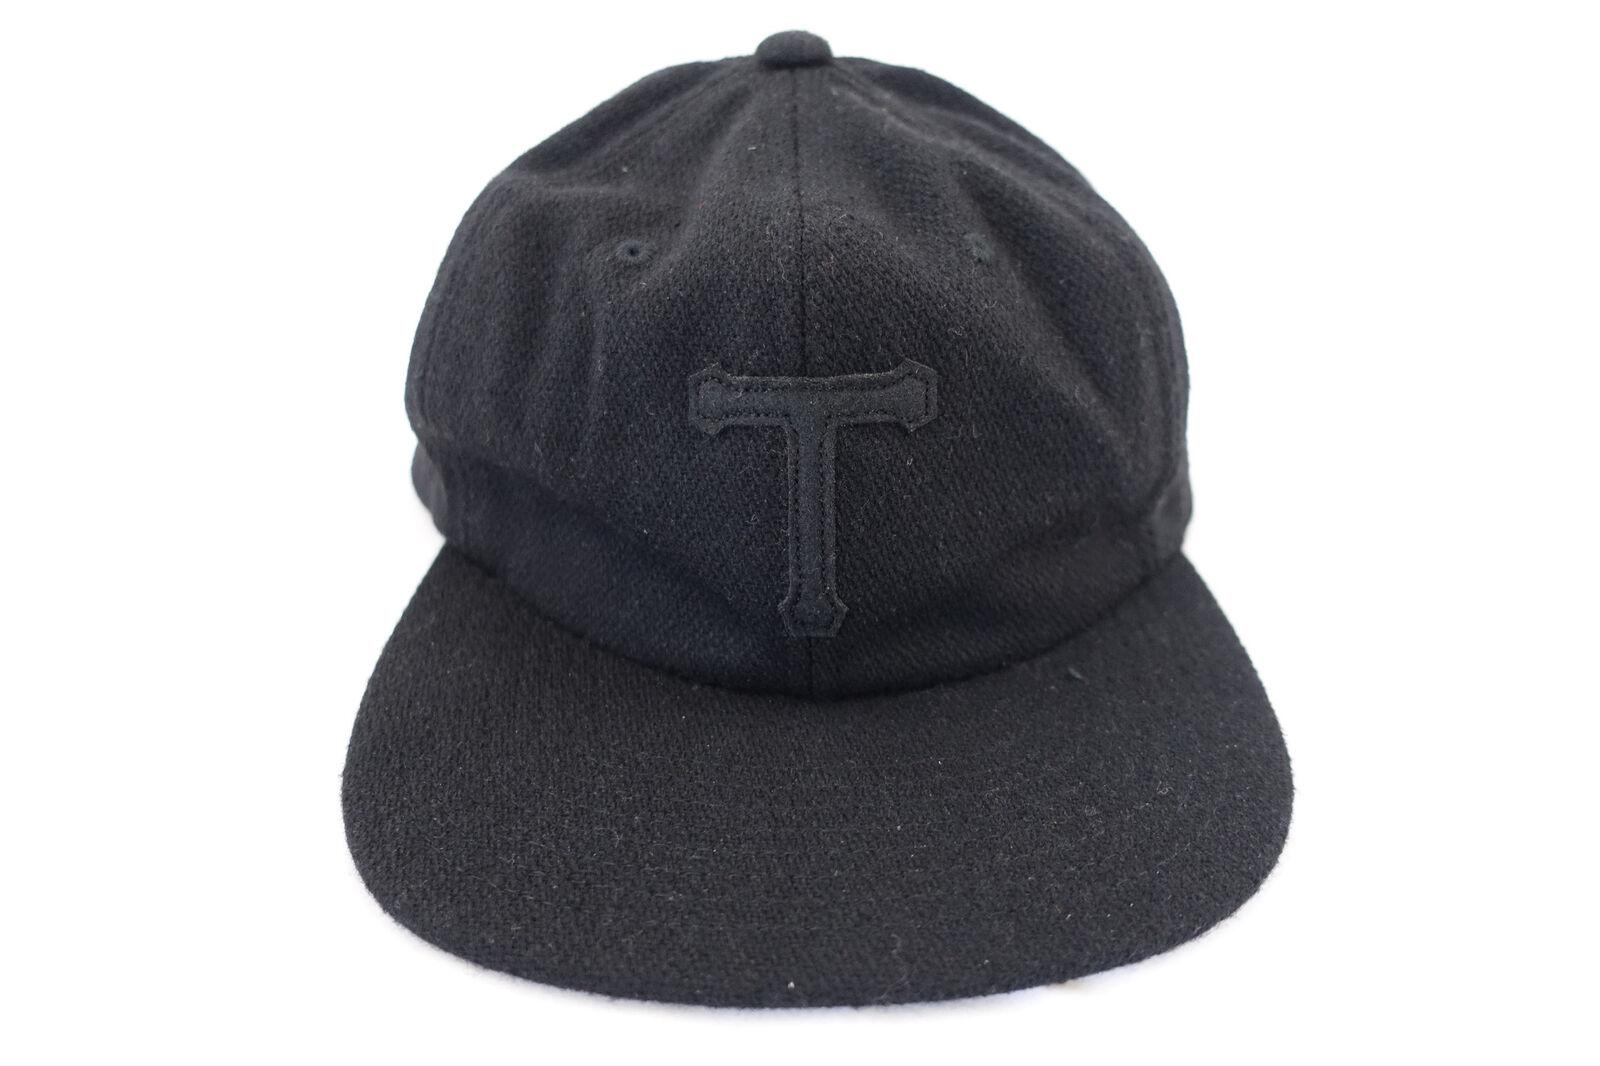 Tavik T-Shirt Schwarz Wollmischung Band Back Baseball Kappe Einstellbar Herren